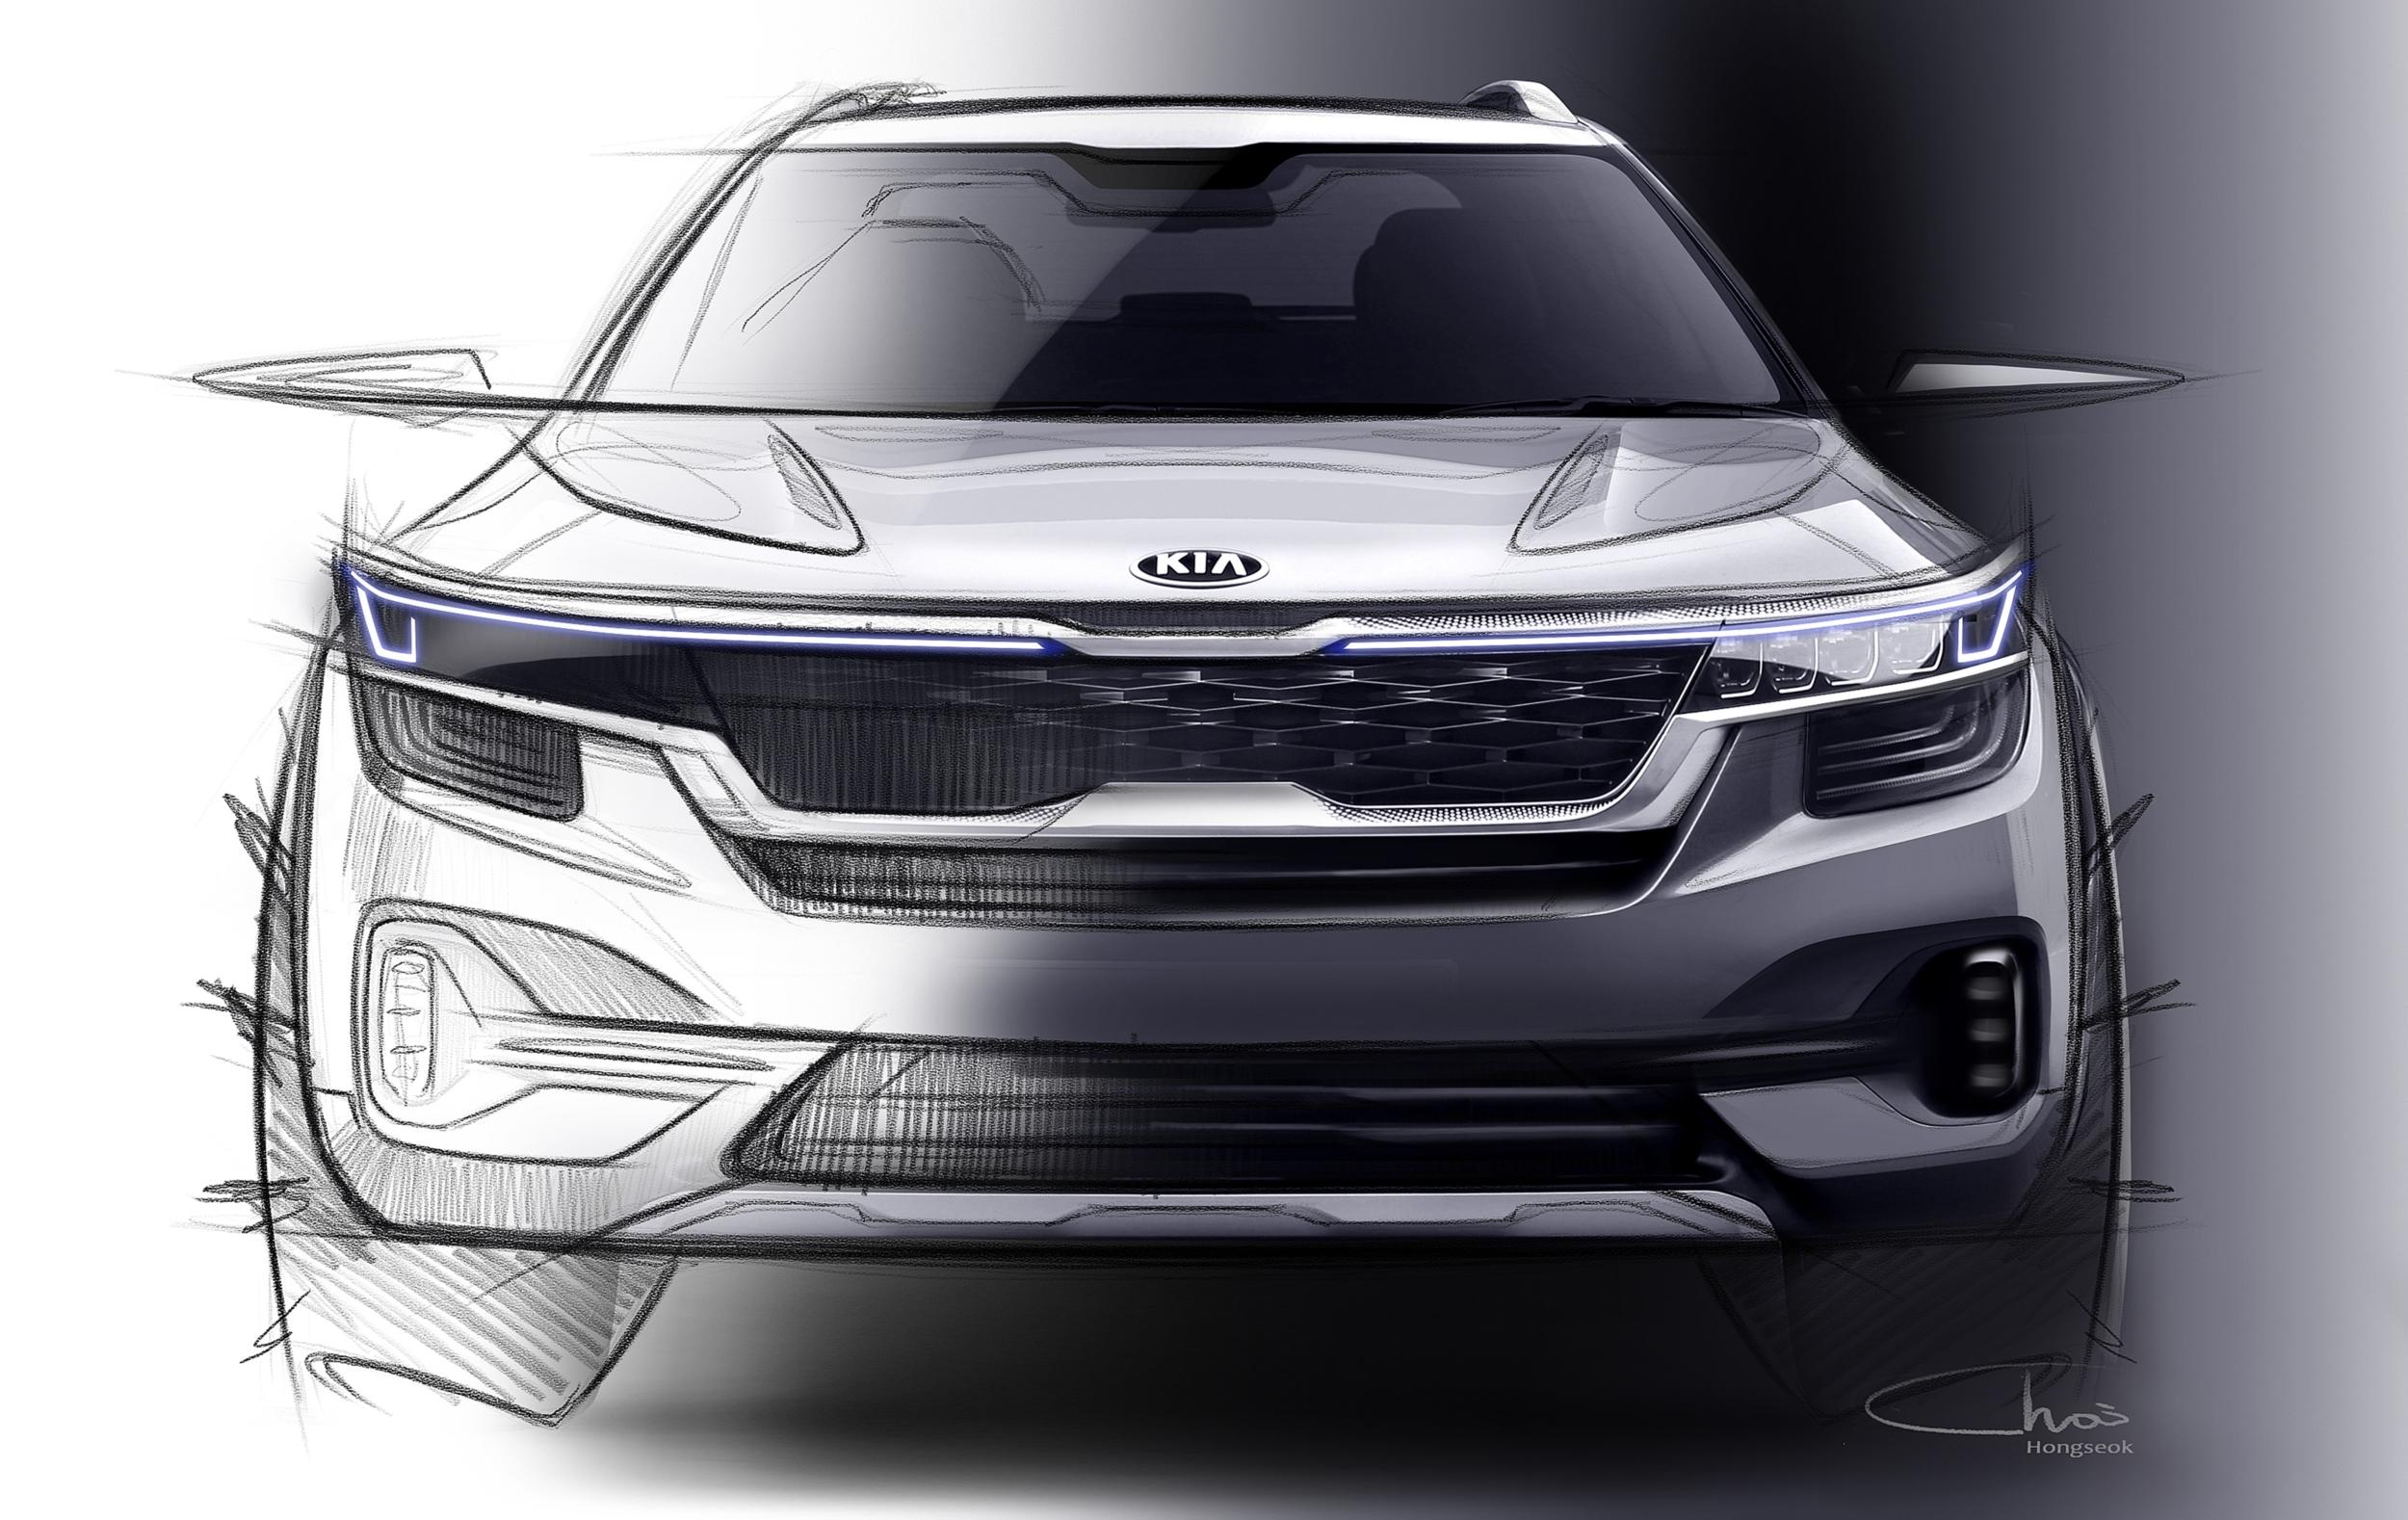 Kia_small_SUV_1